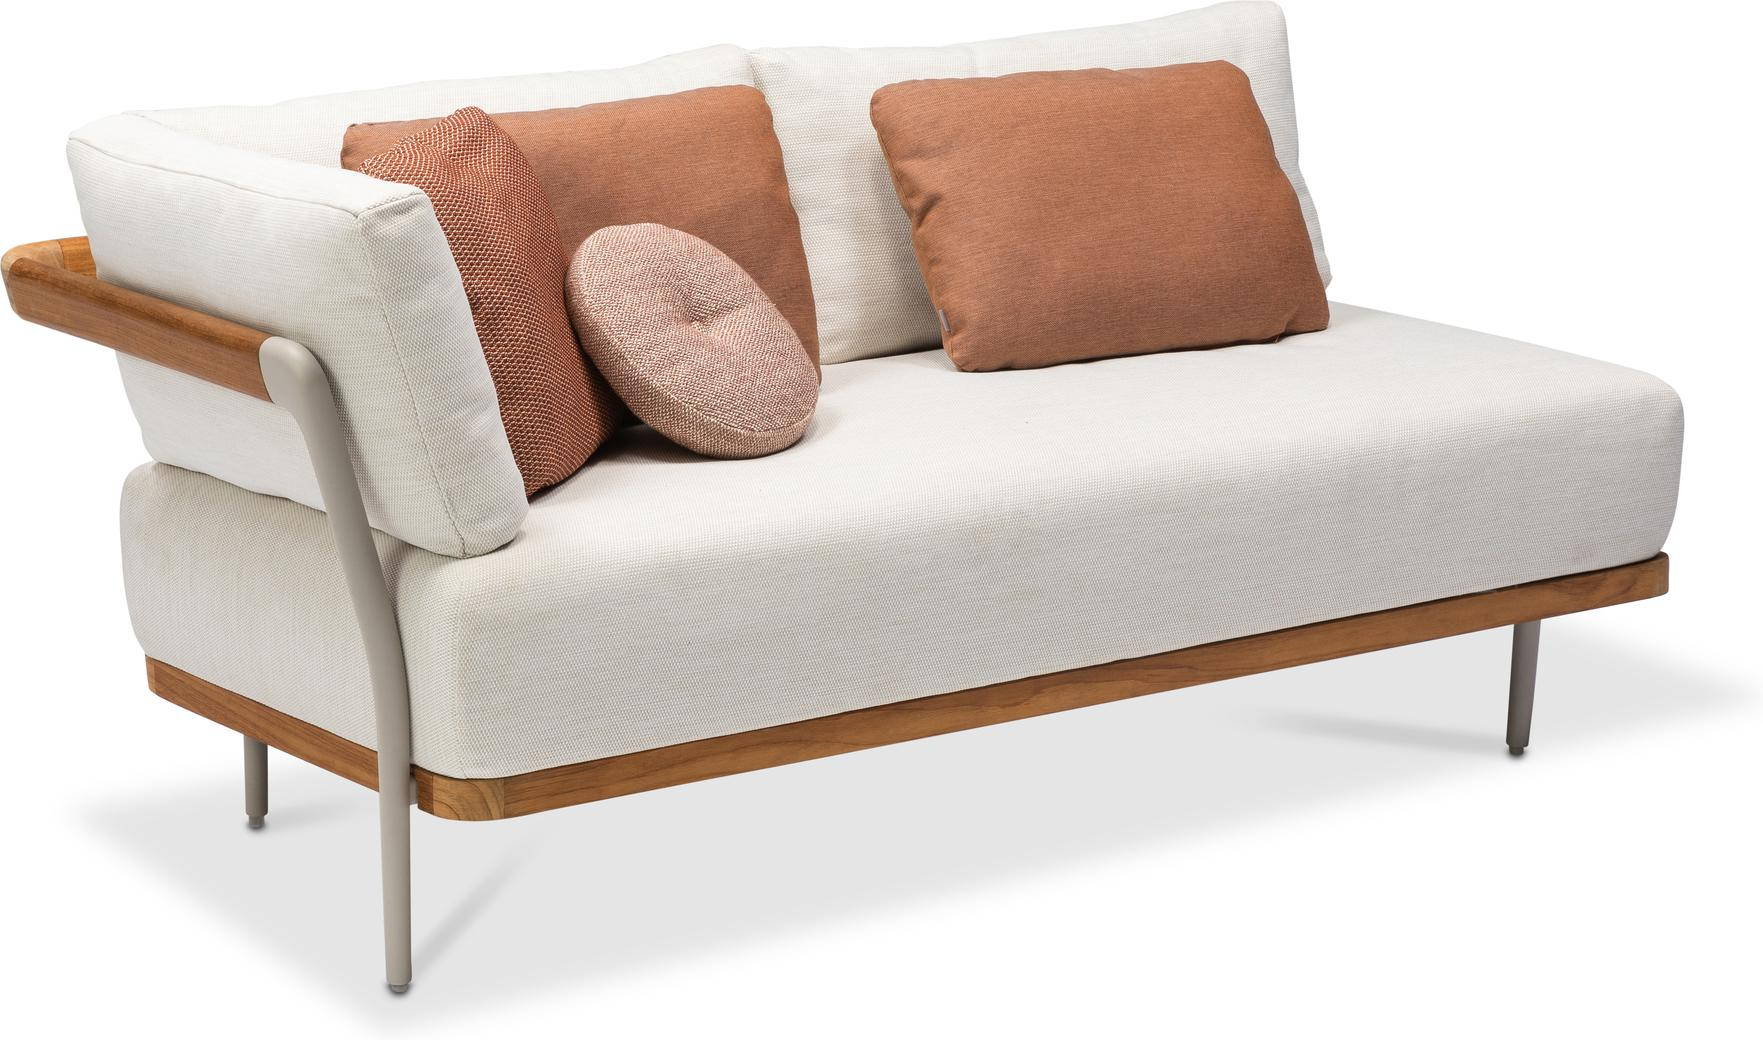 Flex Right corner double seat - flint - teak